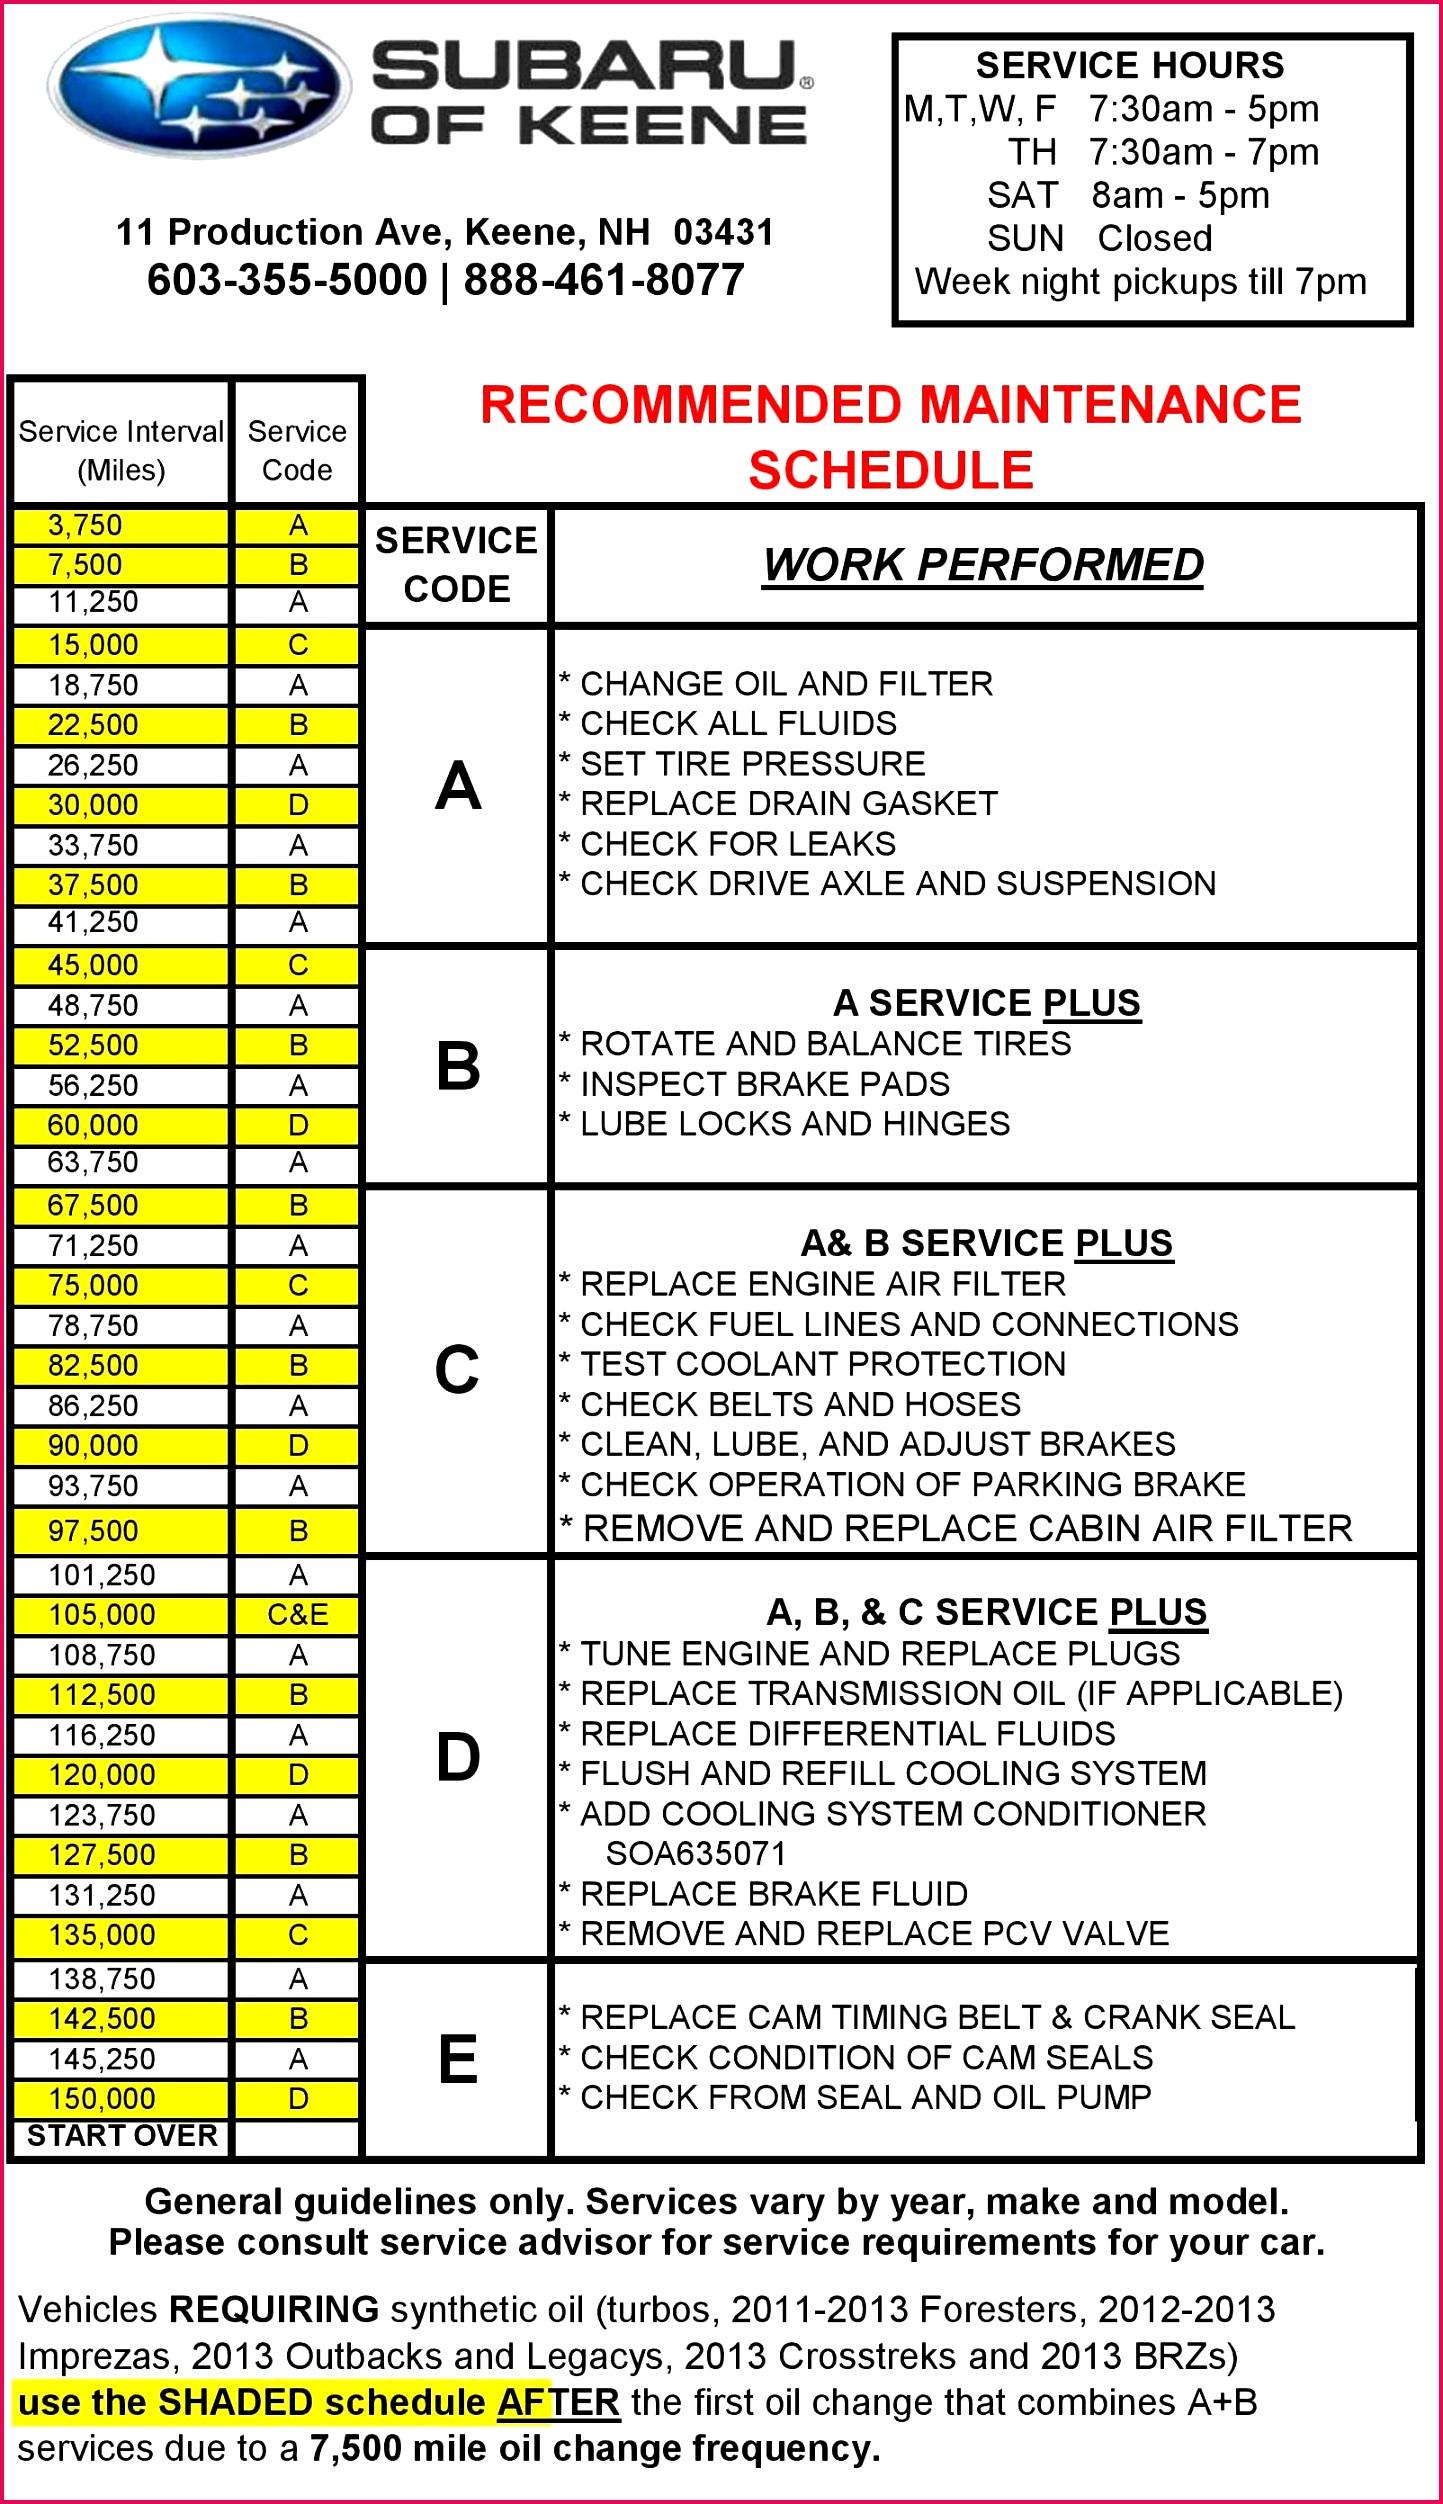 Bill Payment Spreadsheet Excel Templates Inspirational Free Bill Payment Checklist Template with Fleet Maintenance